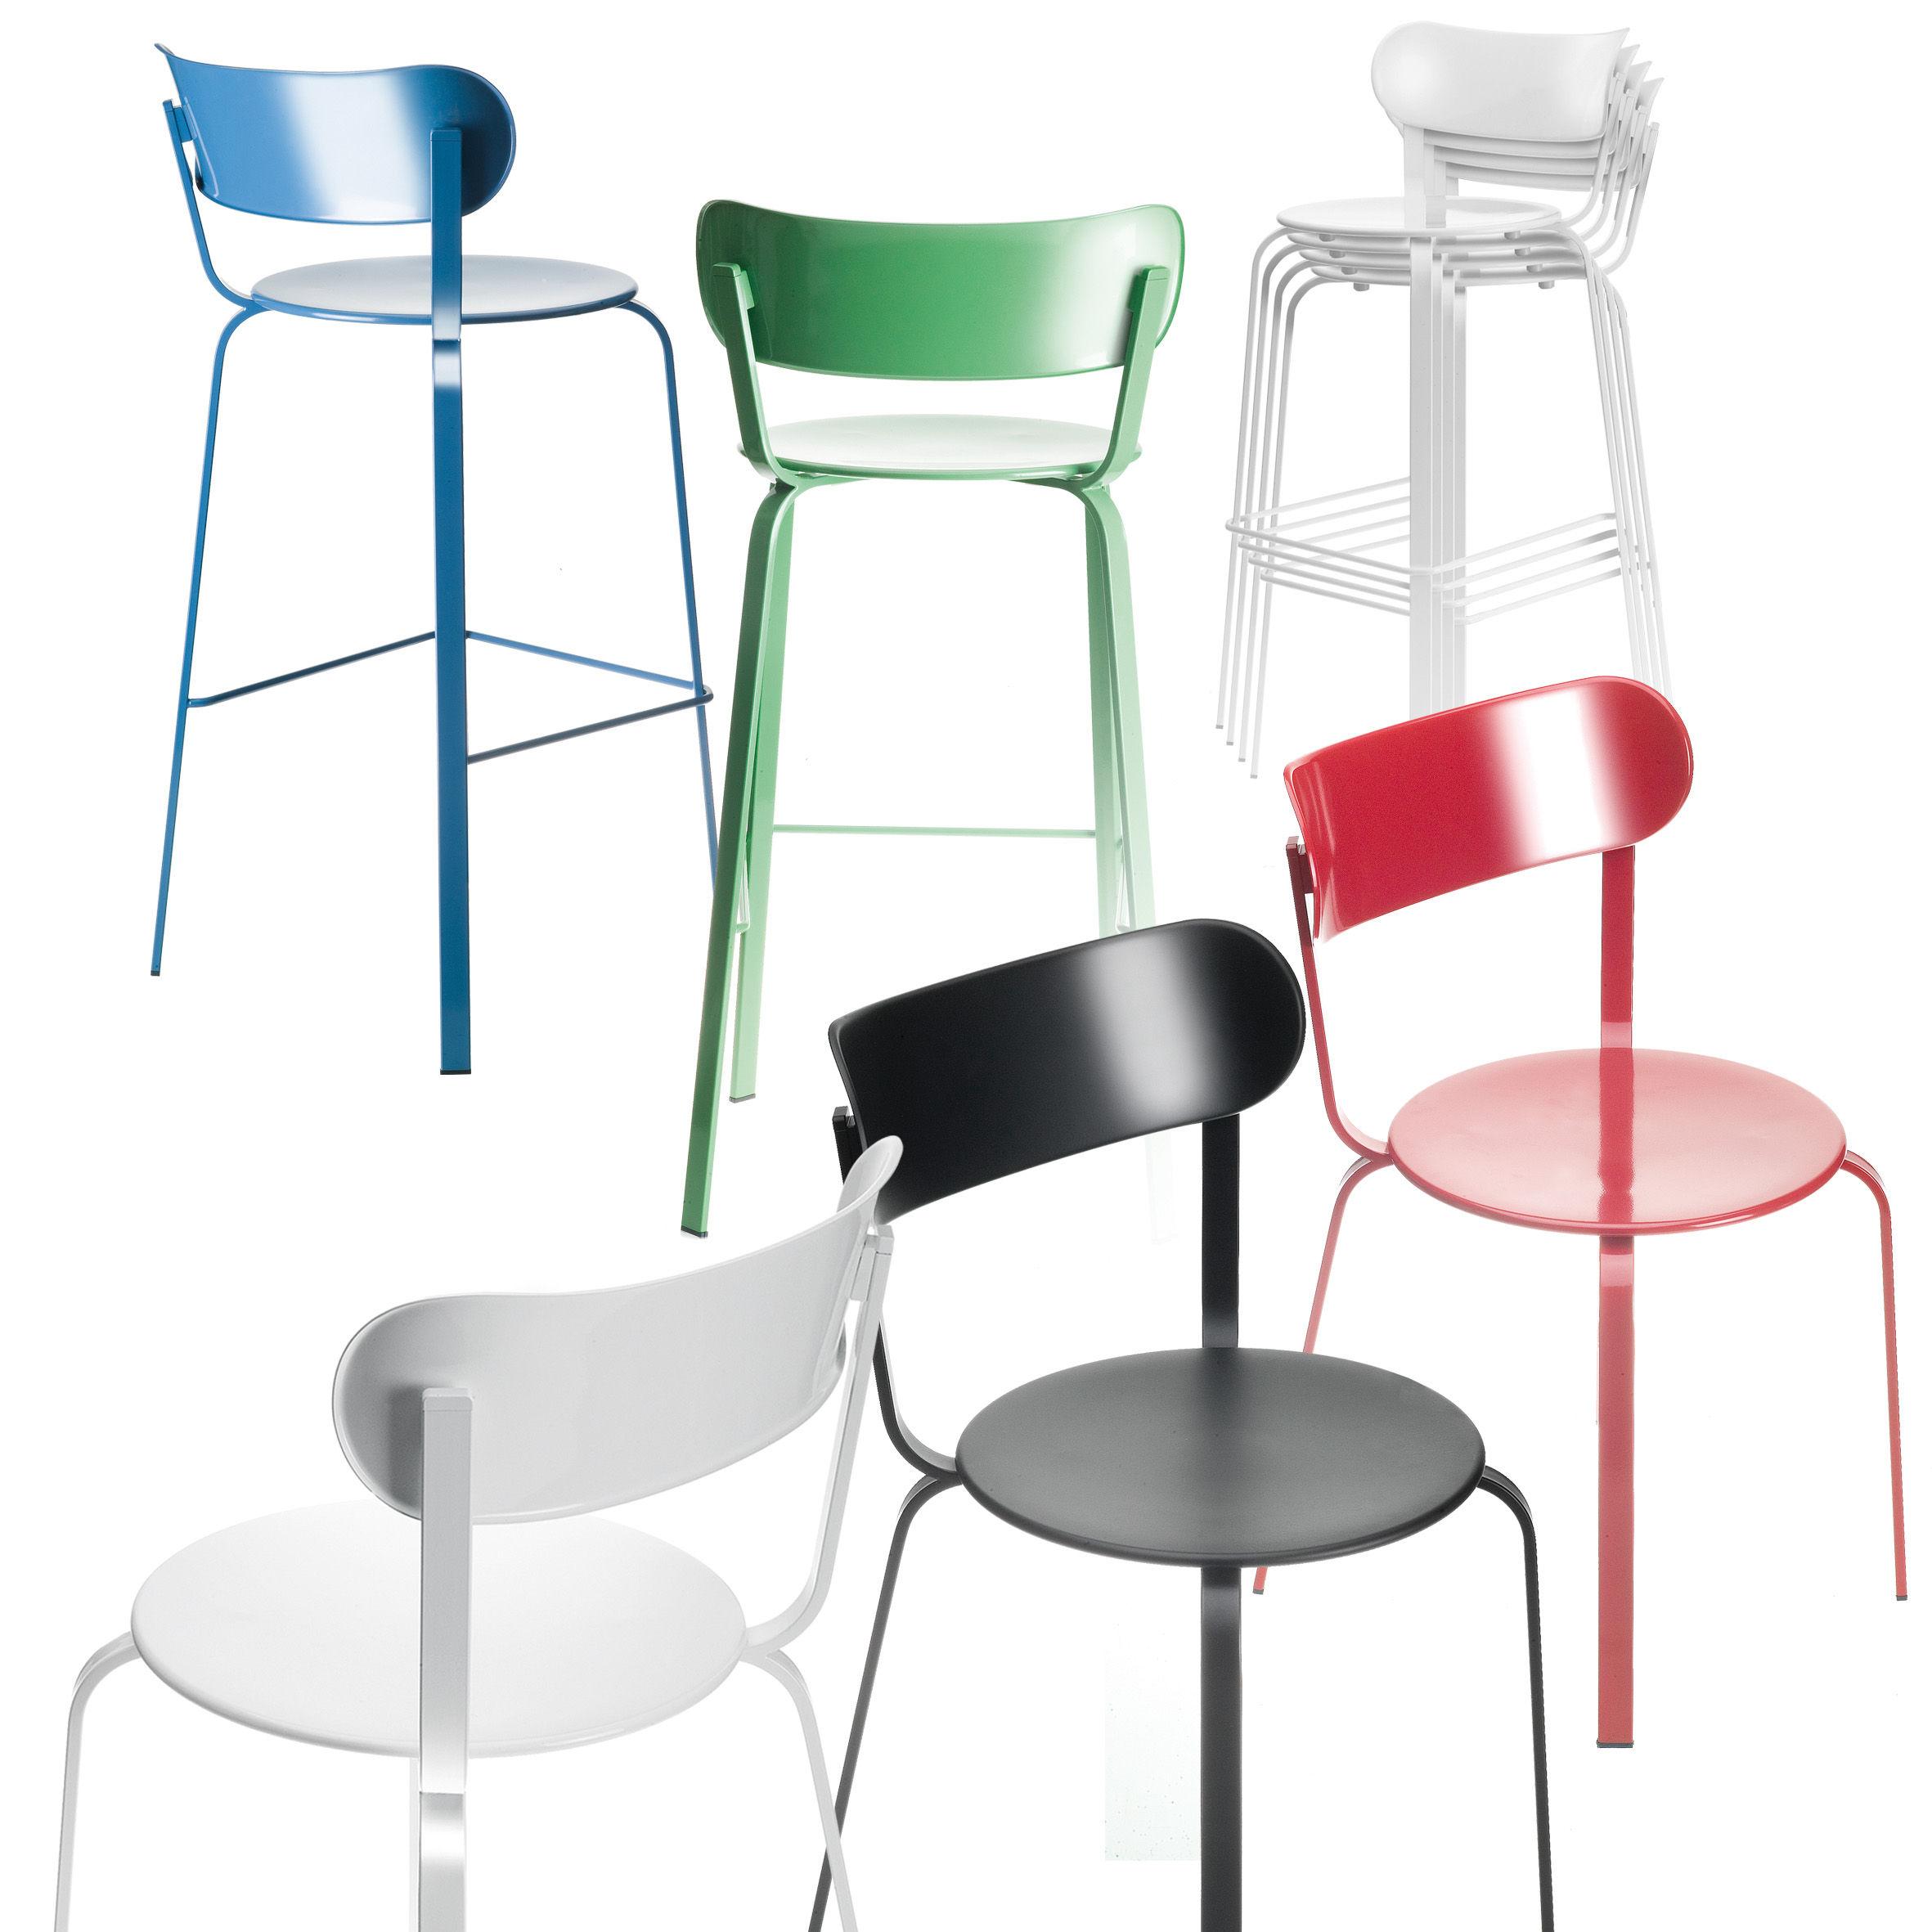 chaise de bar stil h 75 cm m tal m tal laqu noir lapalma made in design. Black Bedroom Furniture Sets. Home Design Ideas